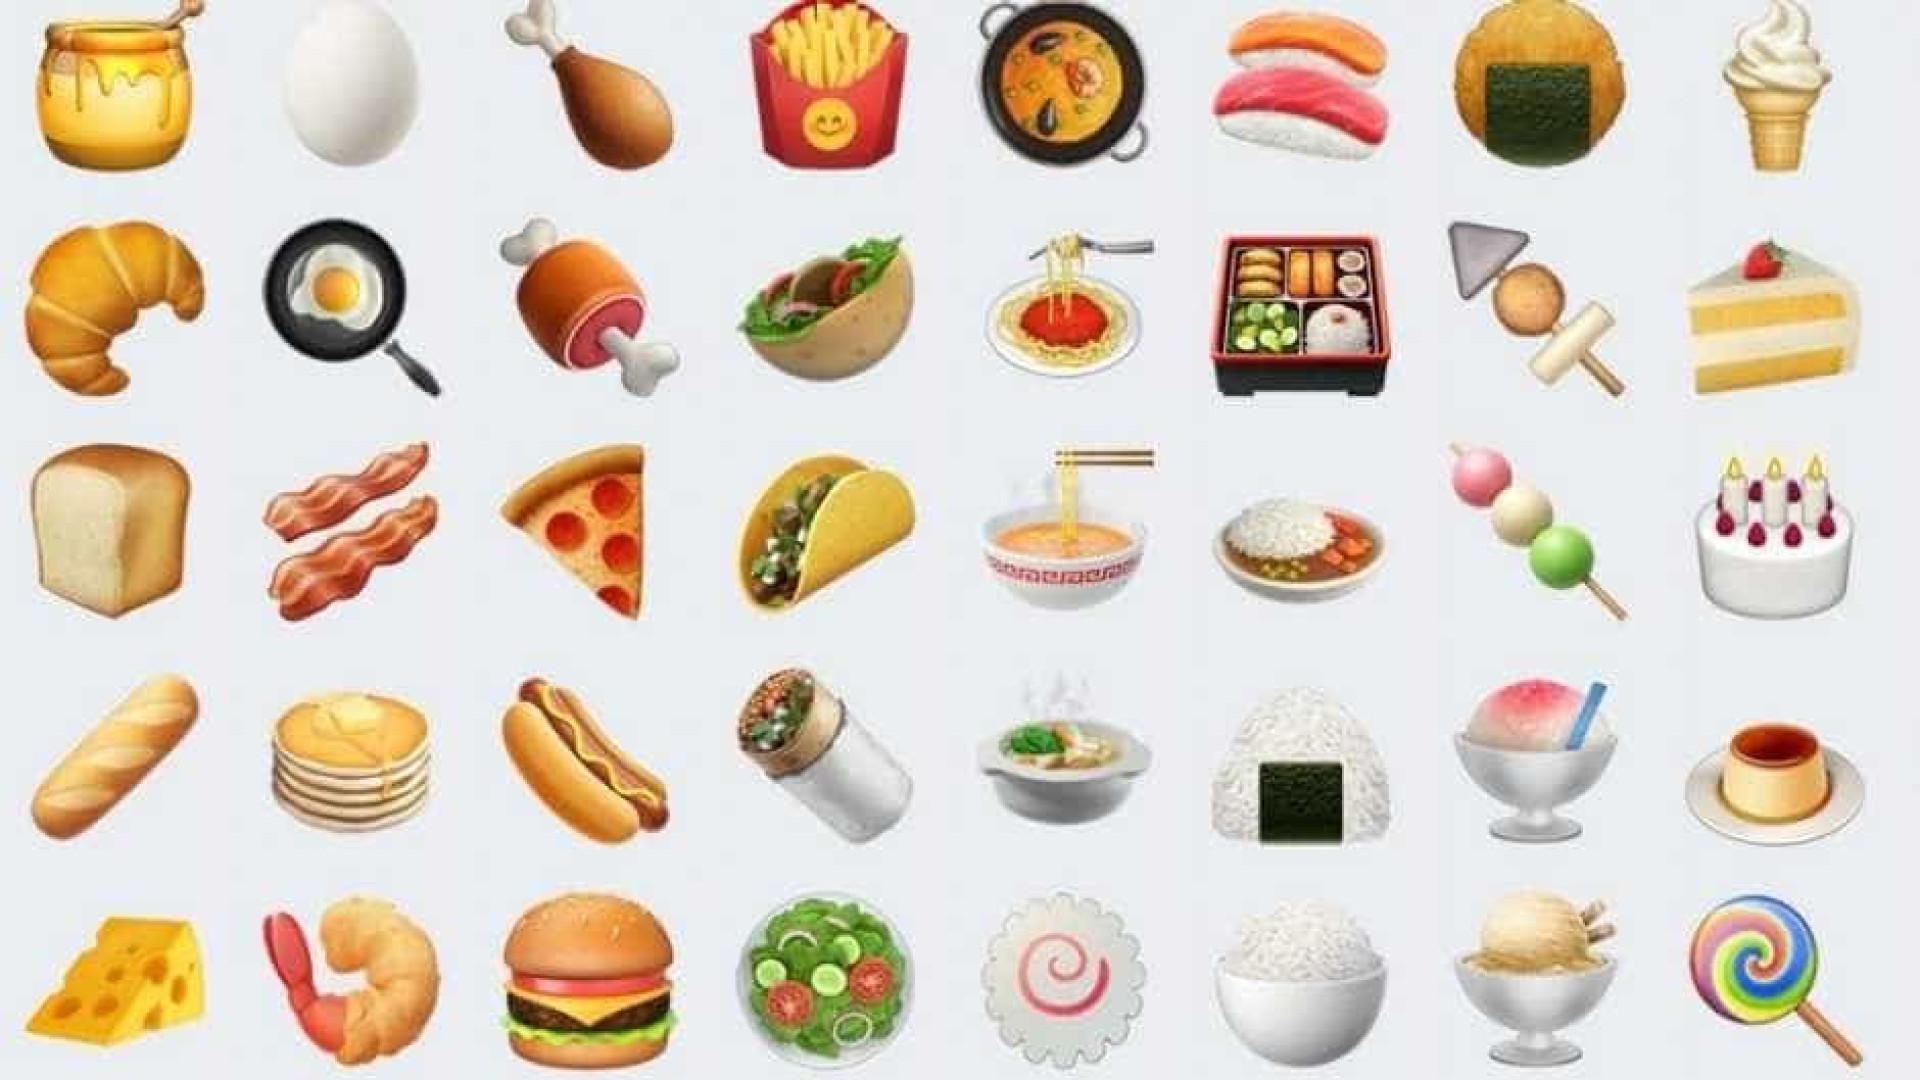 Após crítica a emoji, Google aprende a preparar 'cheeseburger'